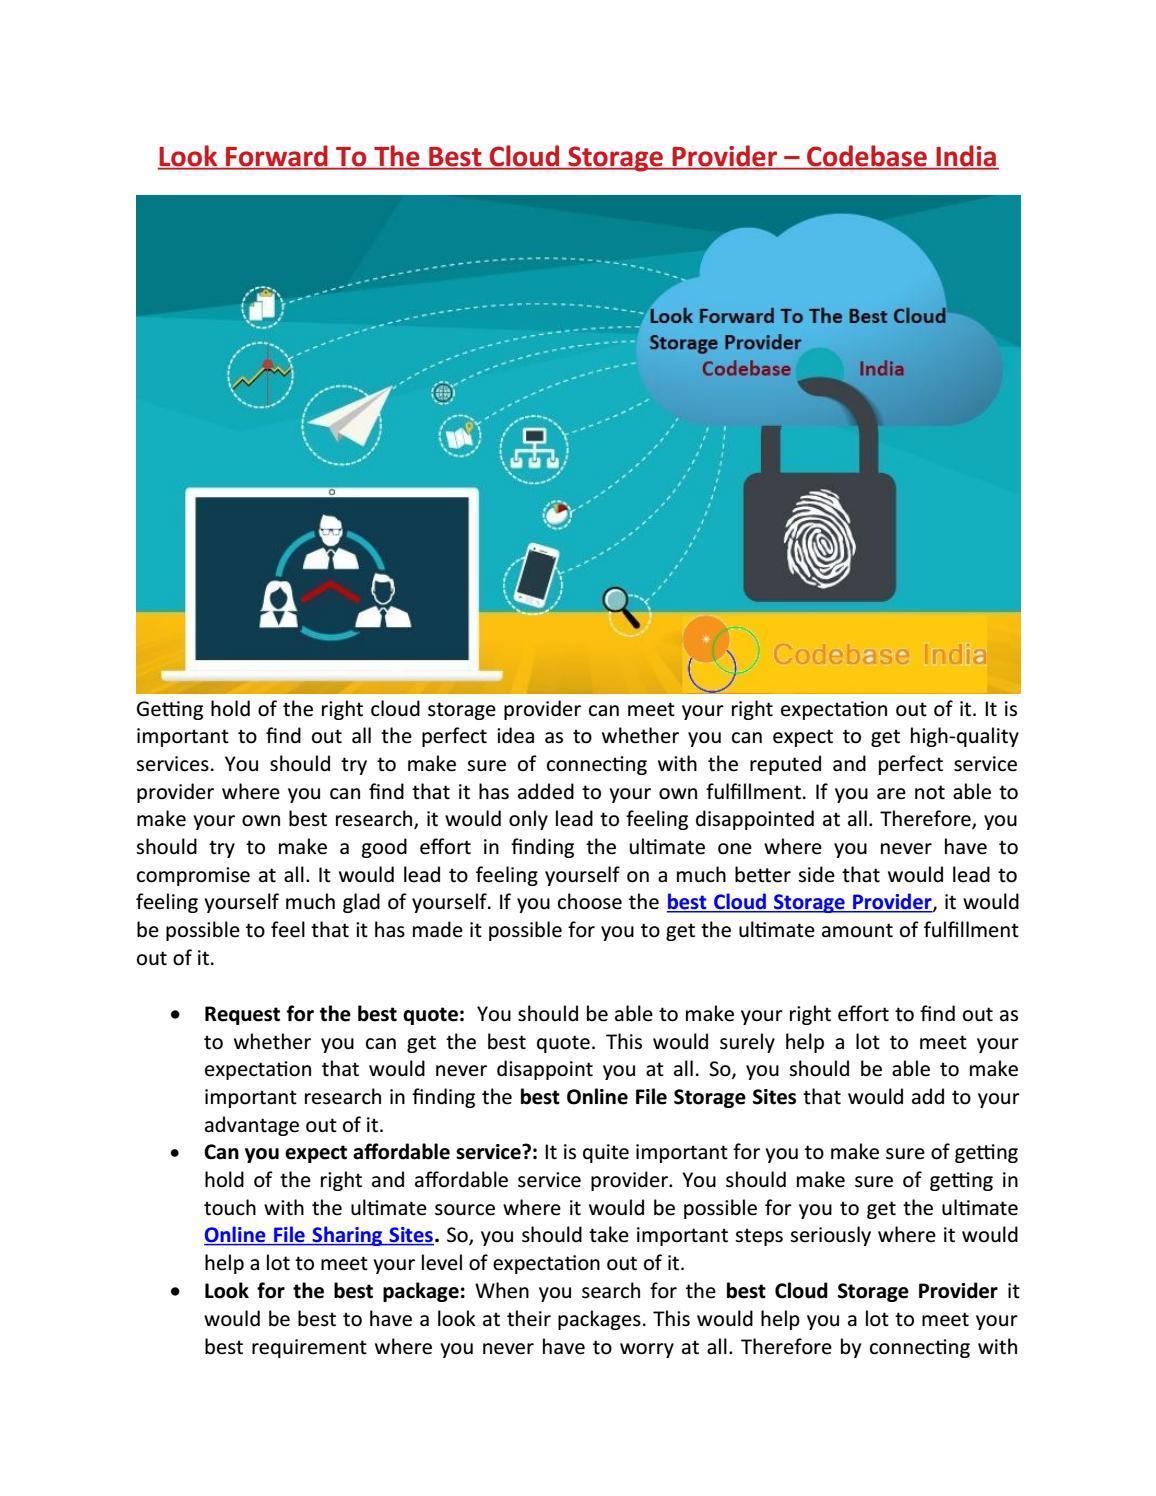 Look Forward To The Best Cloud Storage Provider – Codebase